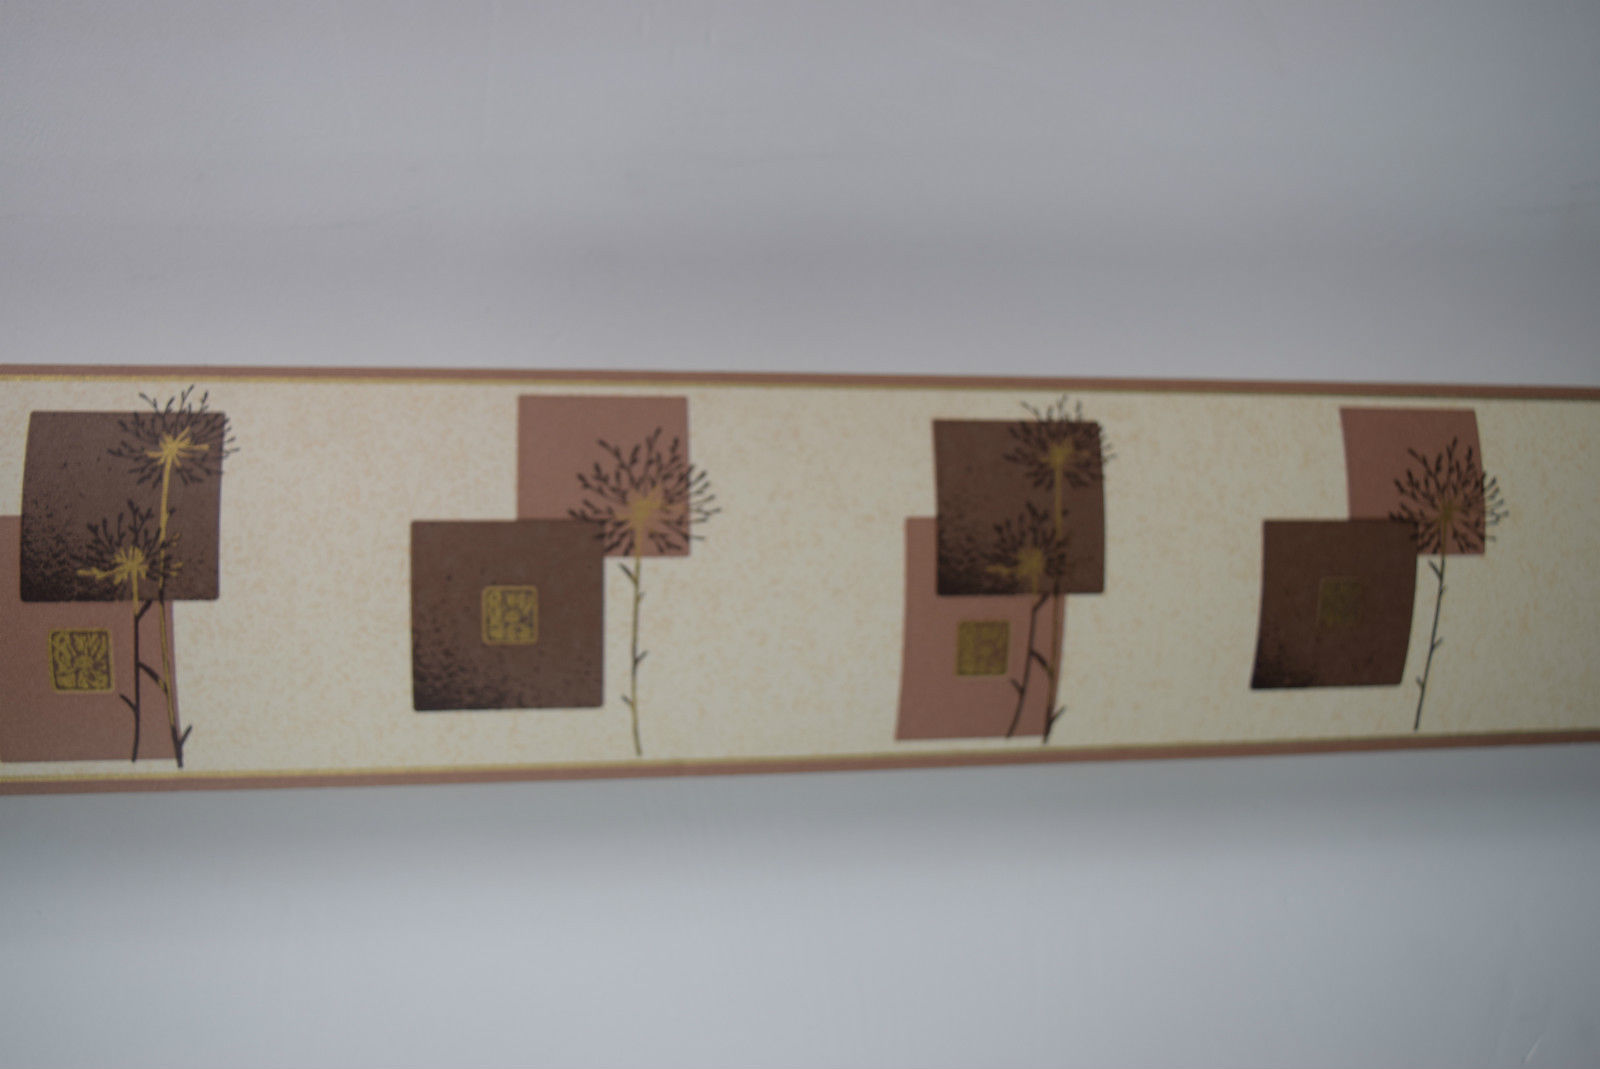 HOLDEN WALLPAPER BORDER MODERN DESIGN CHOCOLATE BROWN BRONZE TREES 1600x1069